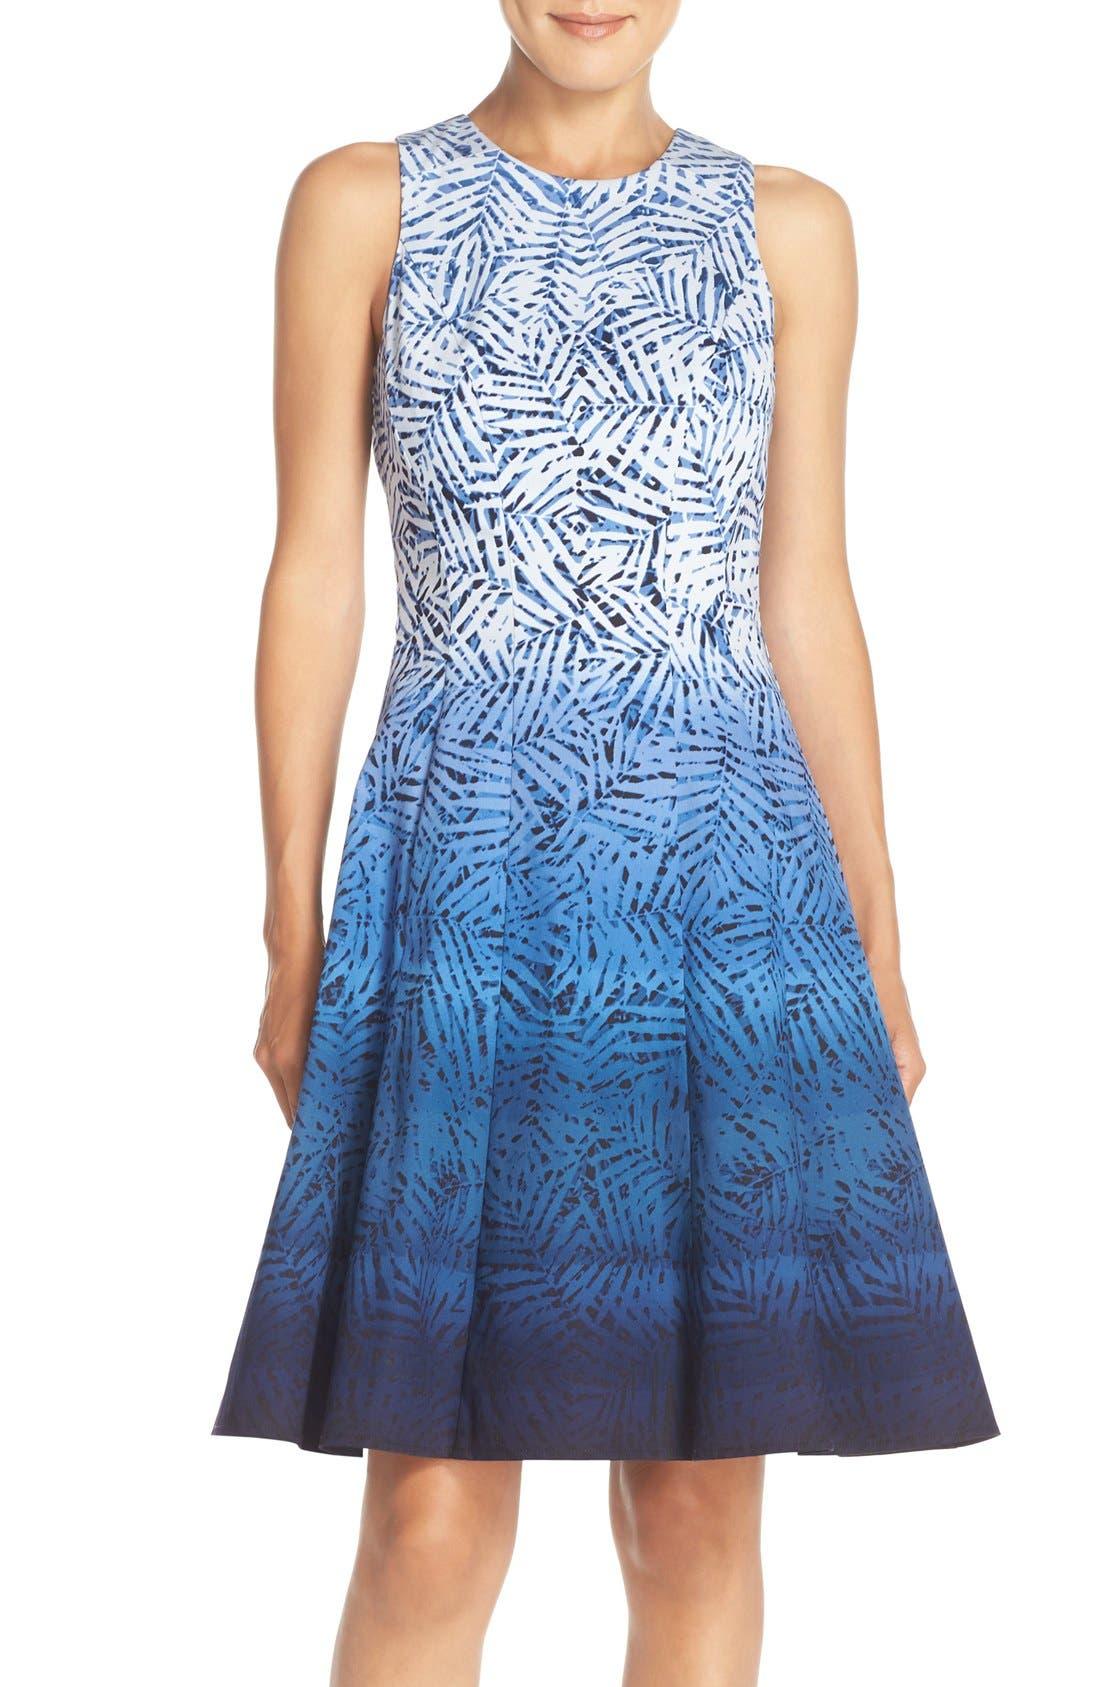 Main Image - Maggy London Ombré Print Fit & Flare Dress